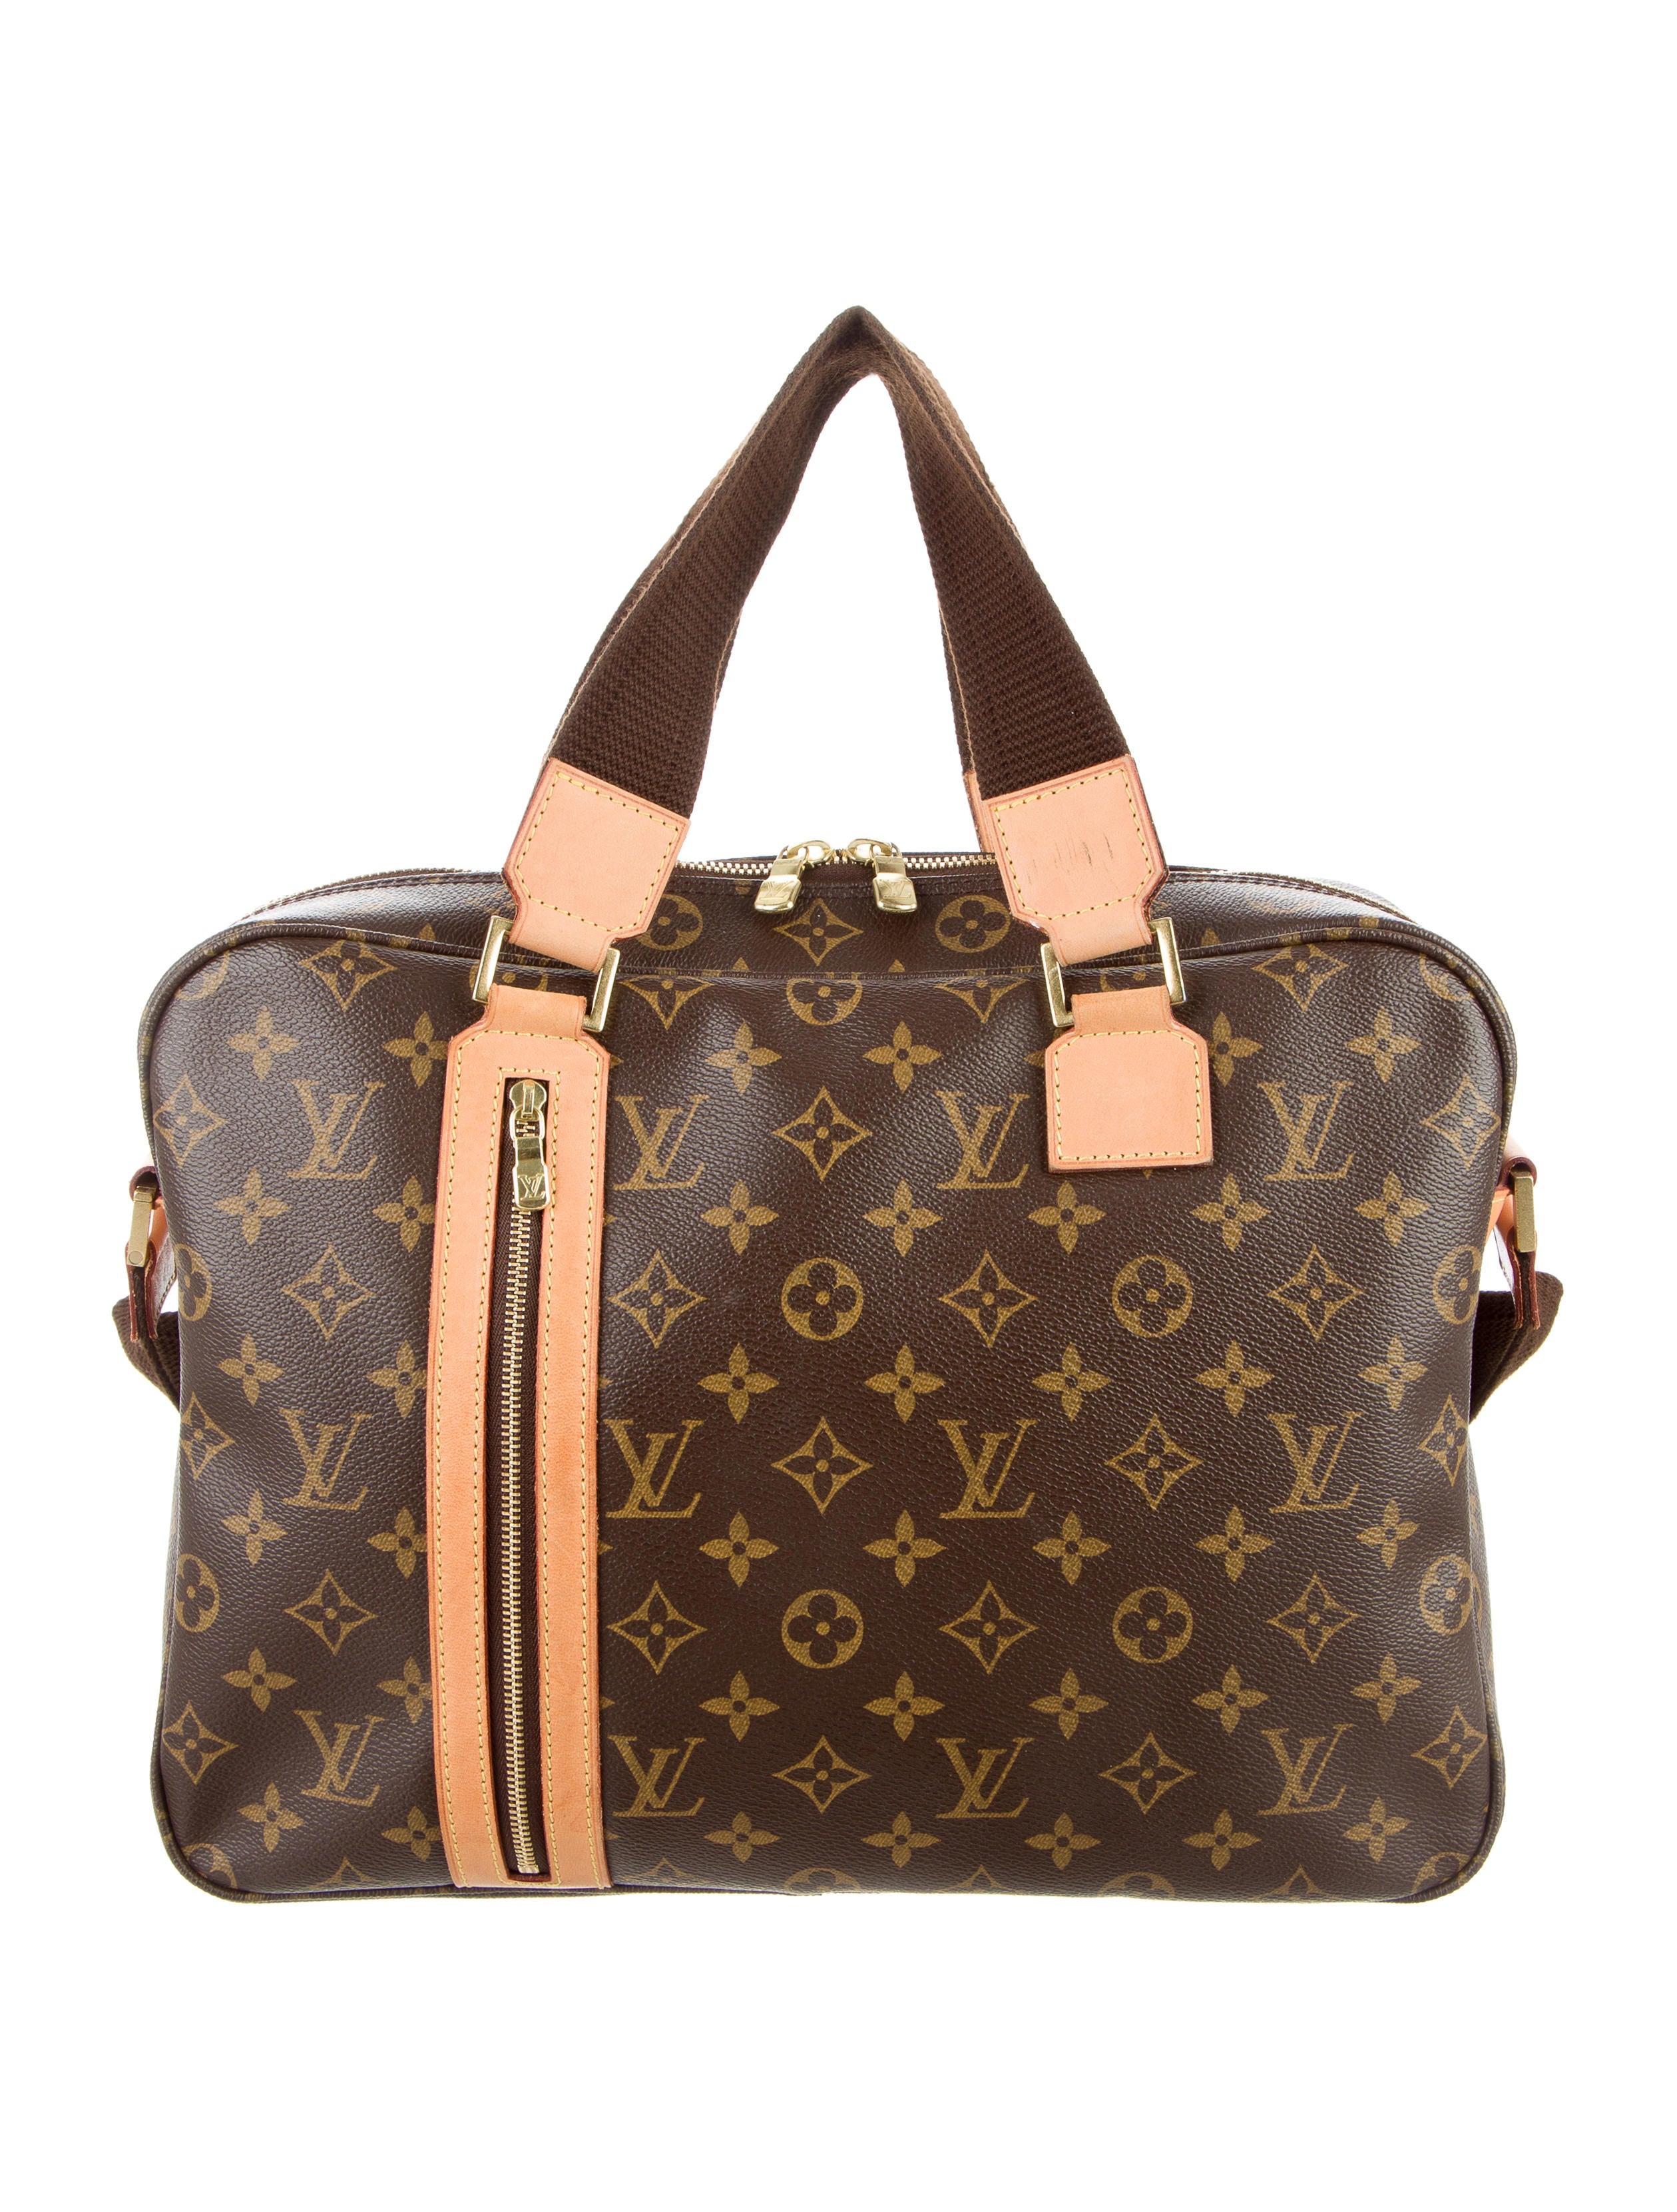 Sac Louis Vuitton Matelassé : Louis vuitton monogram sac bosphore bag handbags